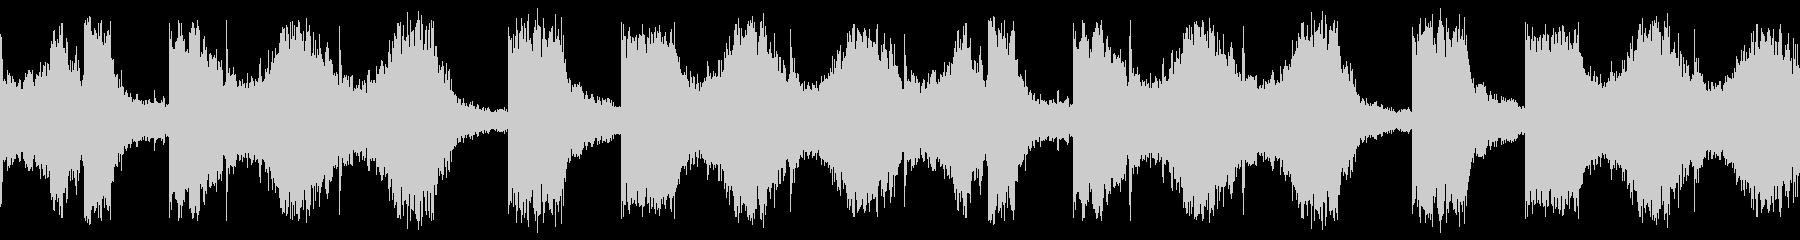 EDM リードシンセ 5 音楽制作用の未再生の波形